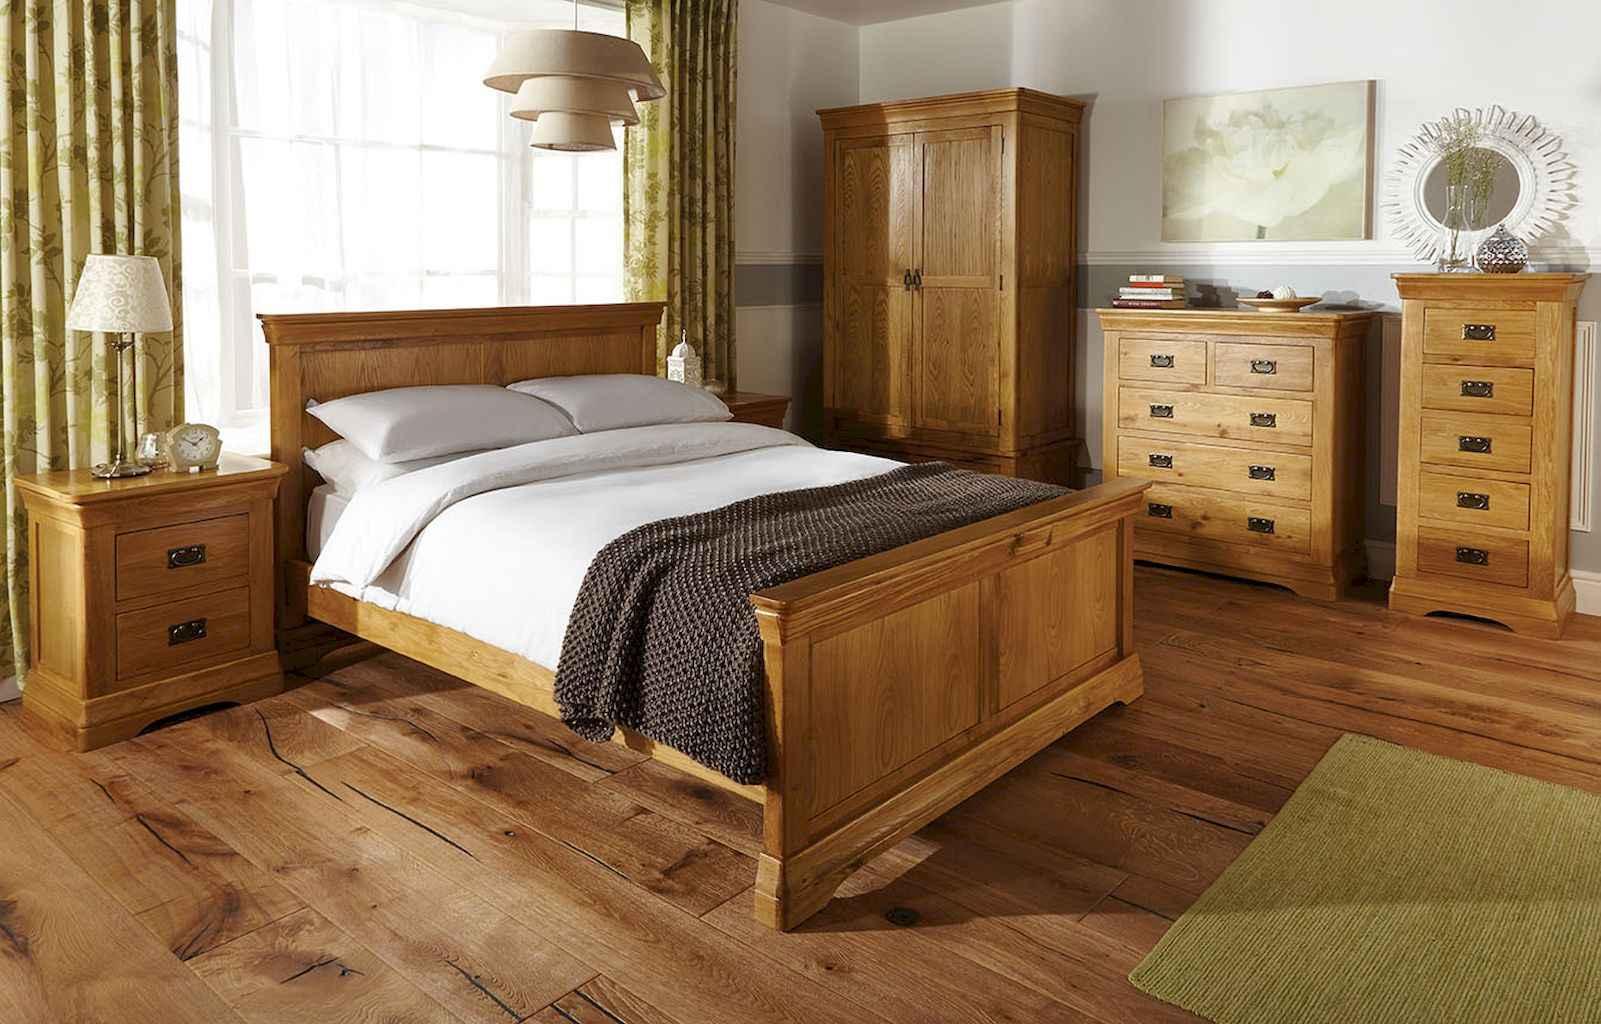 100 Elegant Farmhouse Master Bedroom Decor Ideas